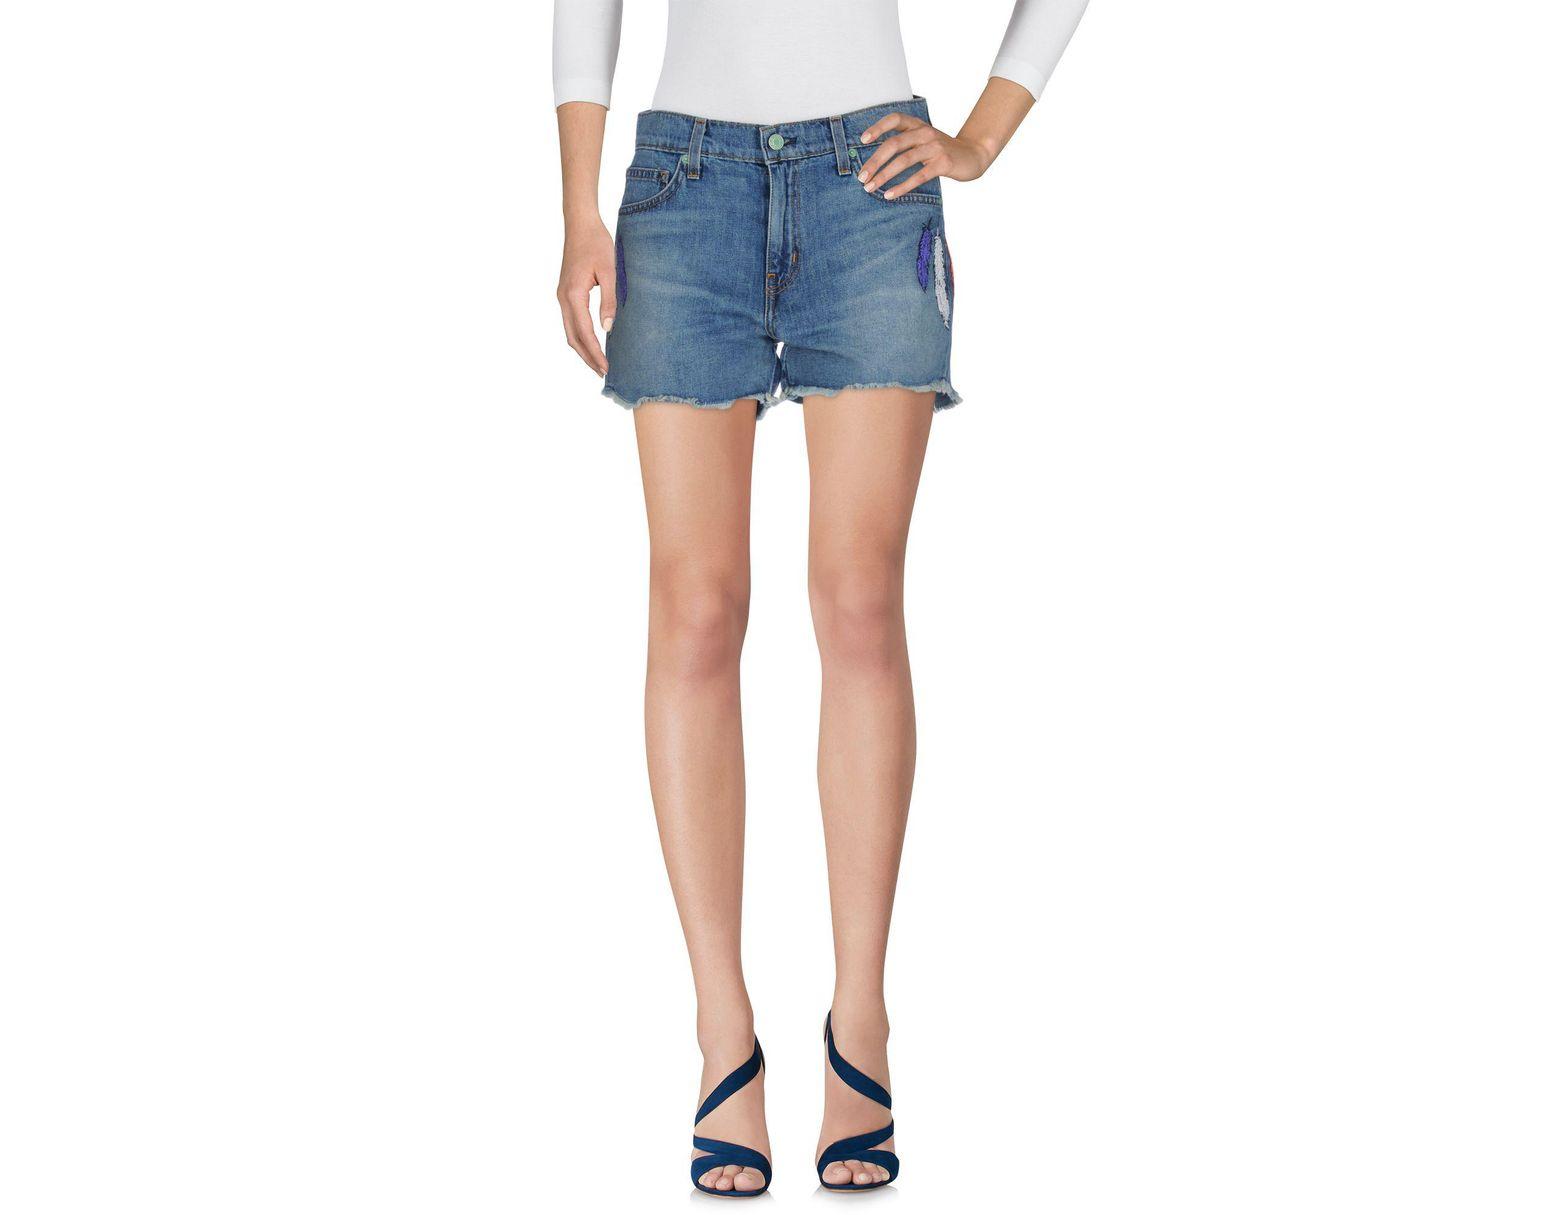 68130d940706 Shorts vaqueros de mujer de color azul